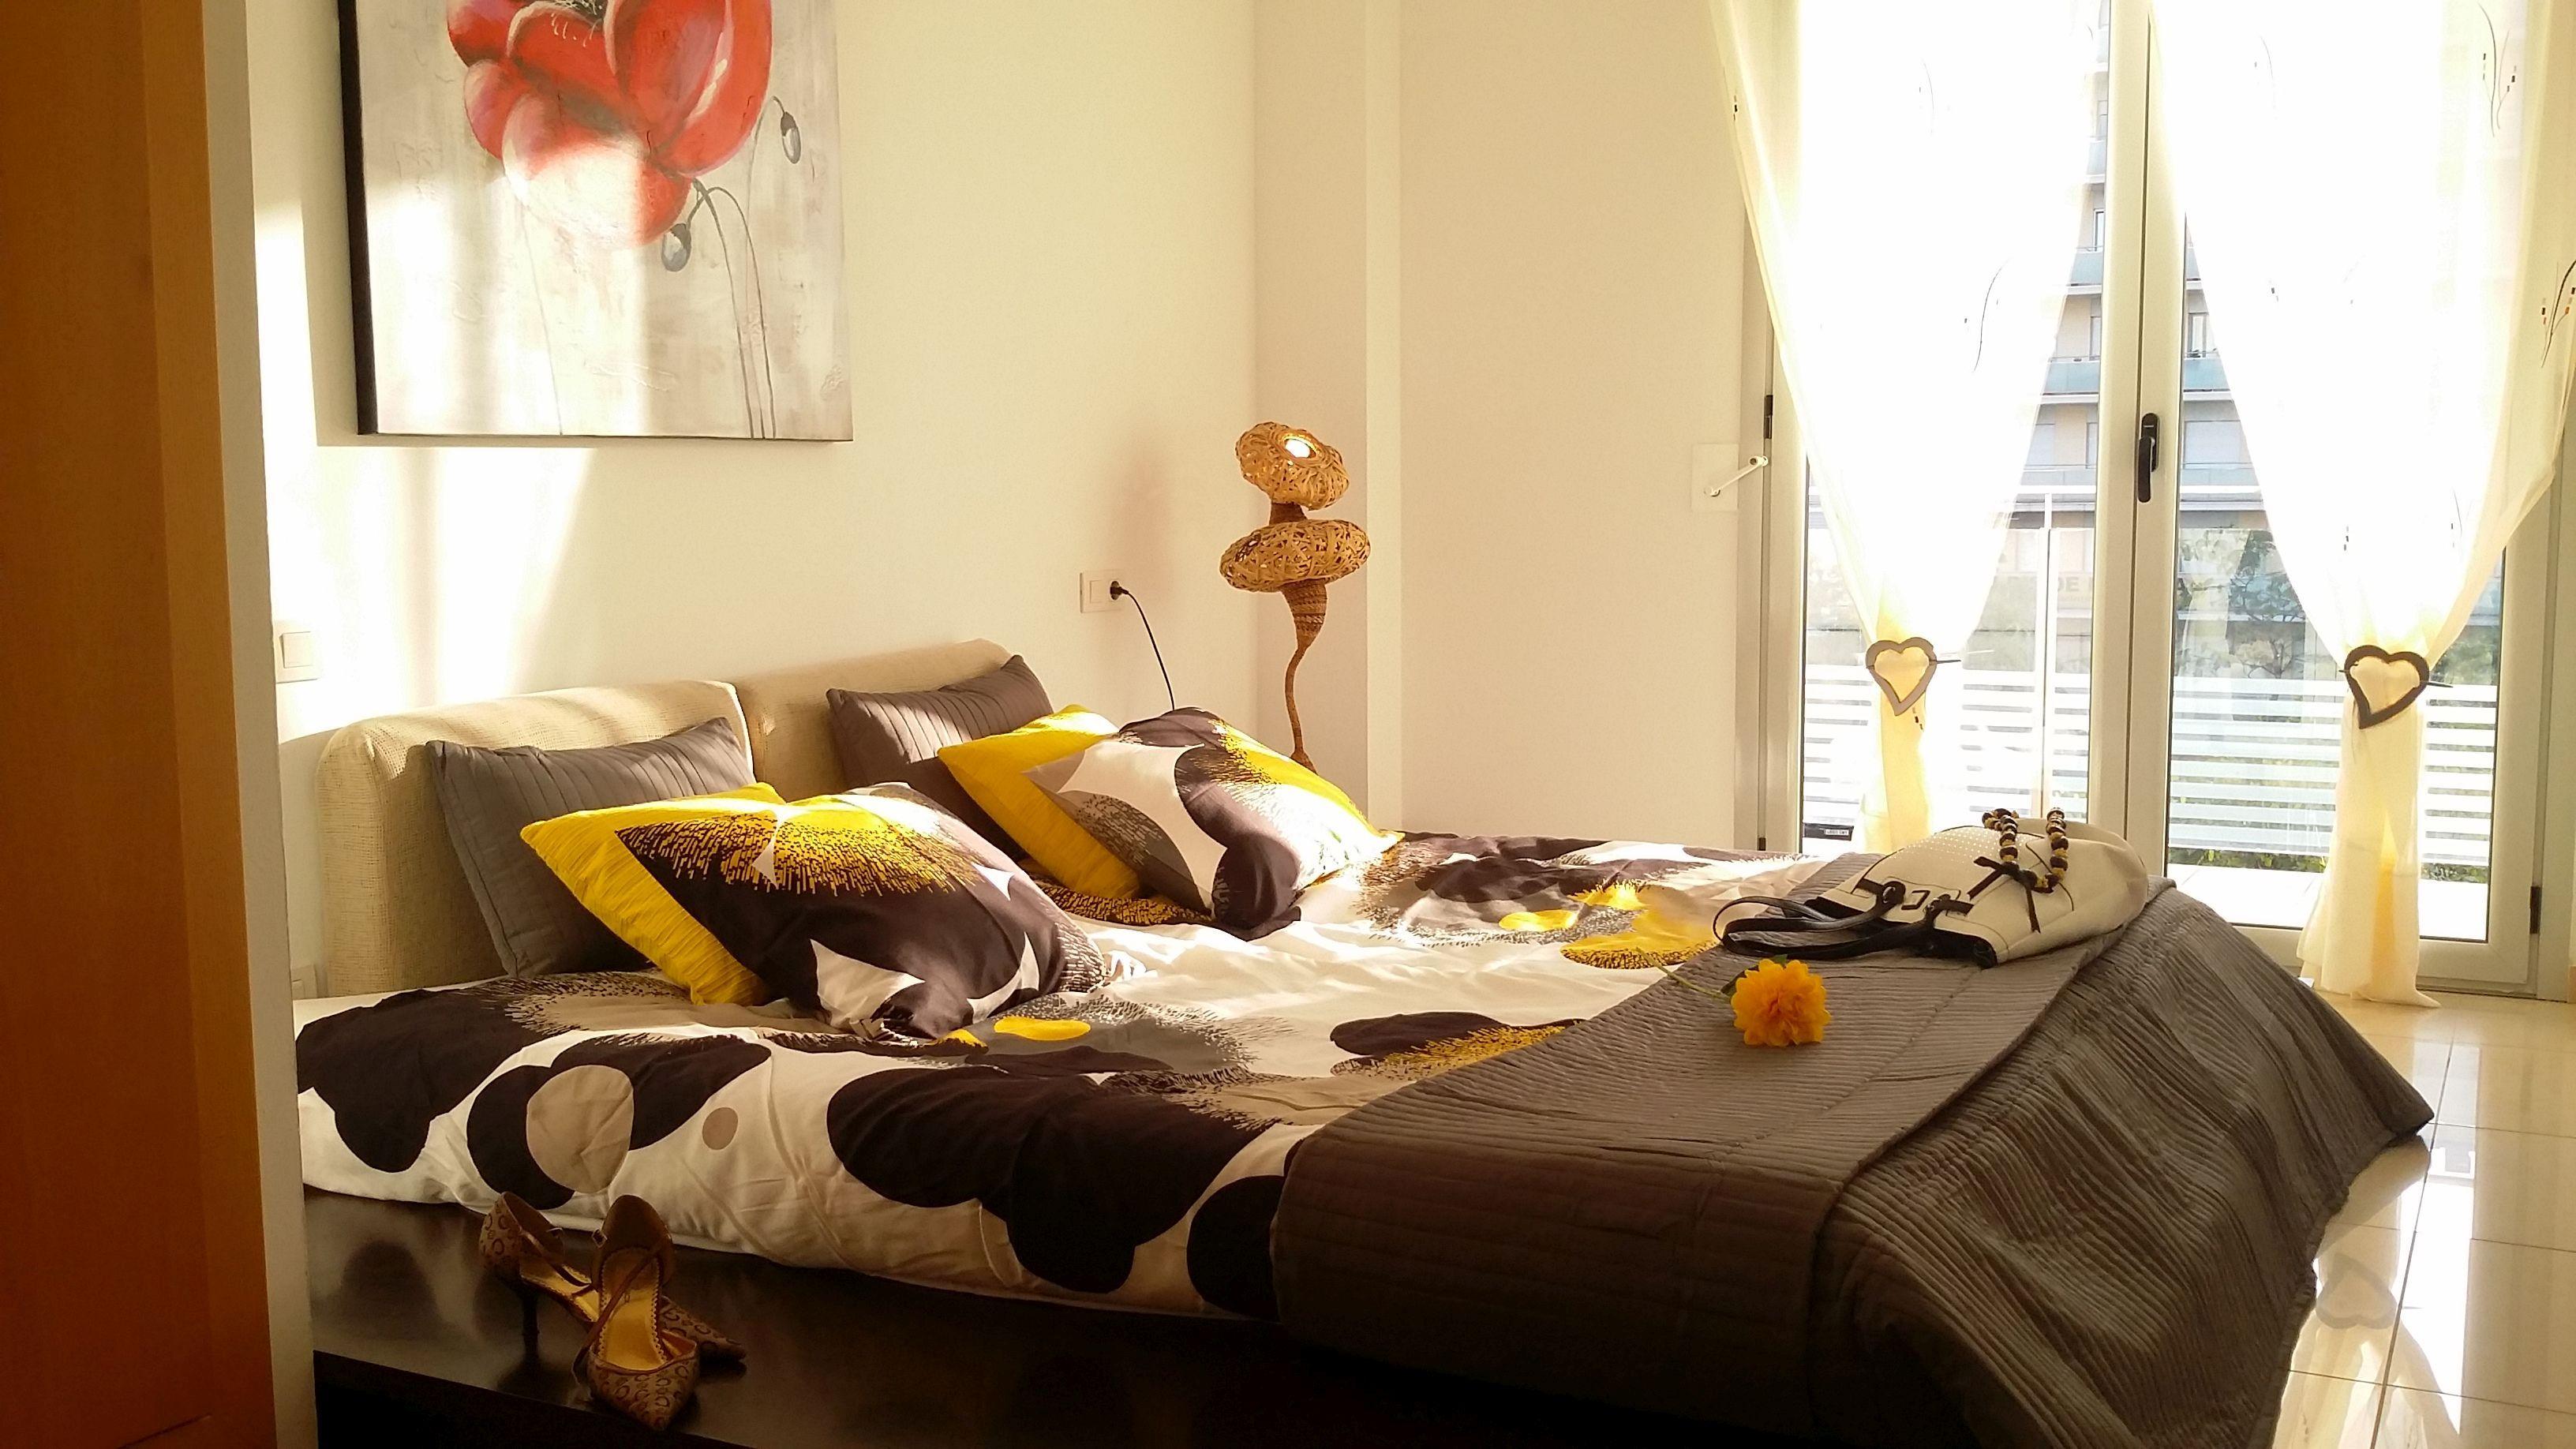 Bedroom I: 1 double bed, balcony